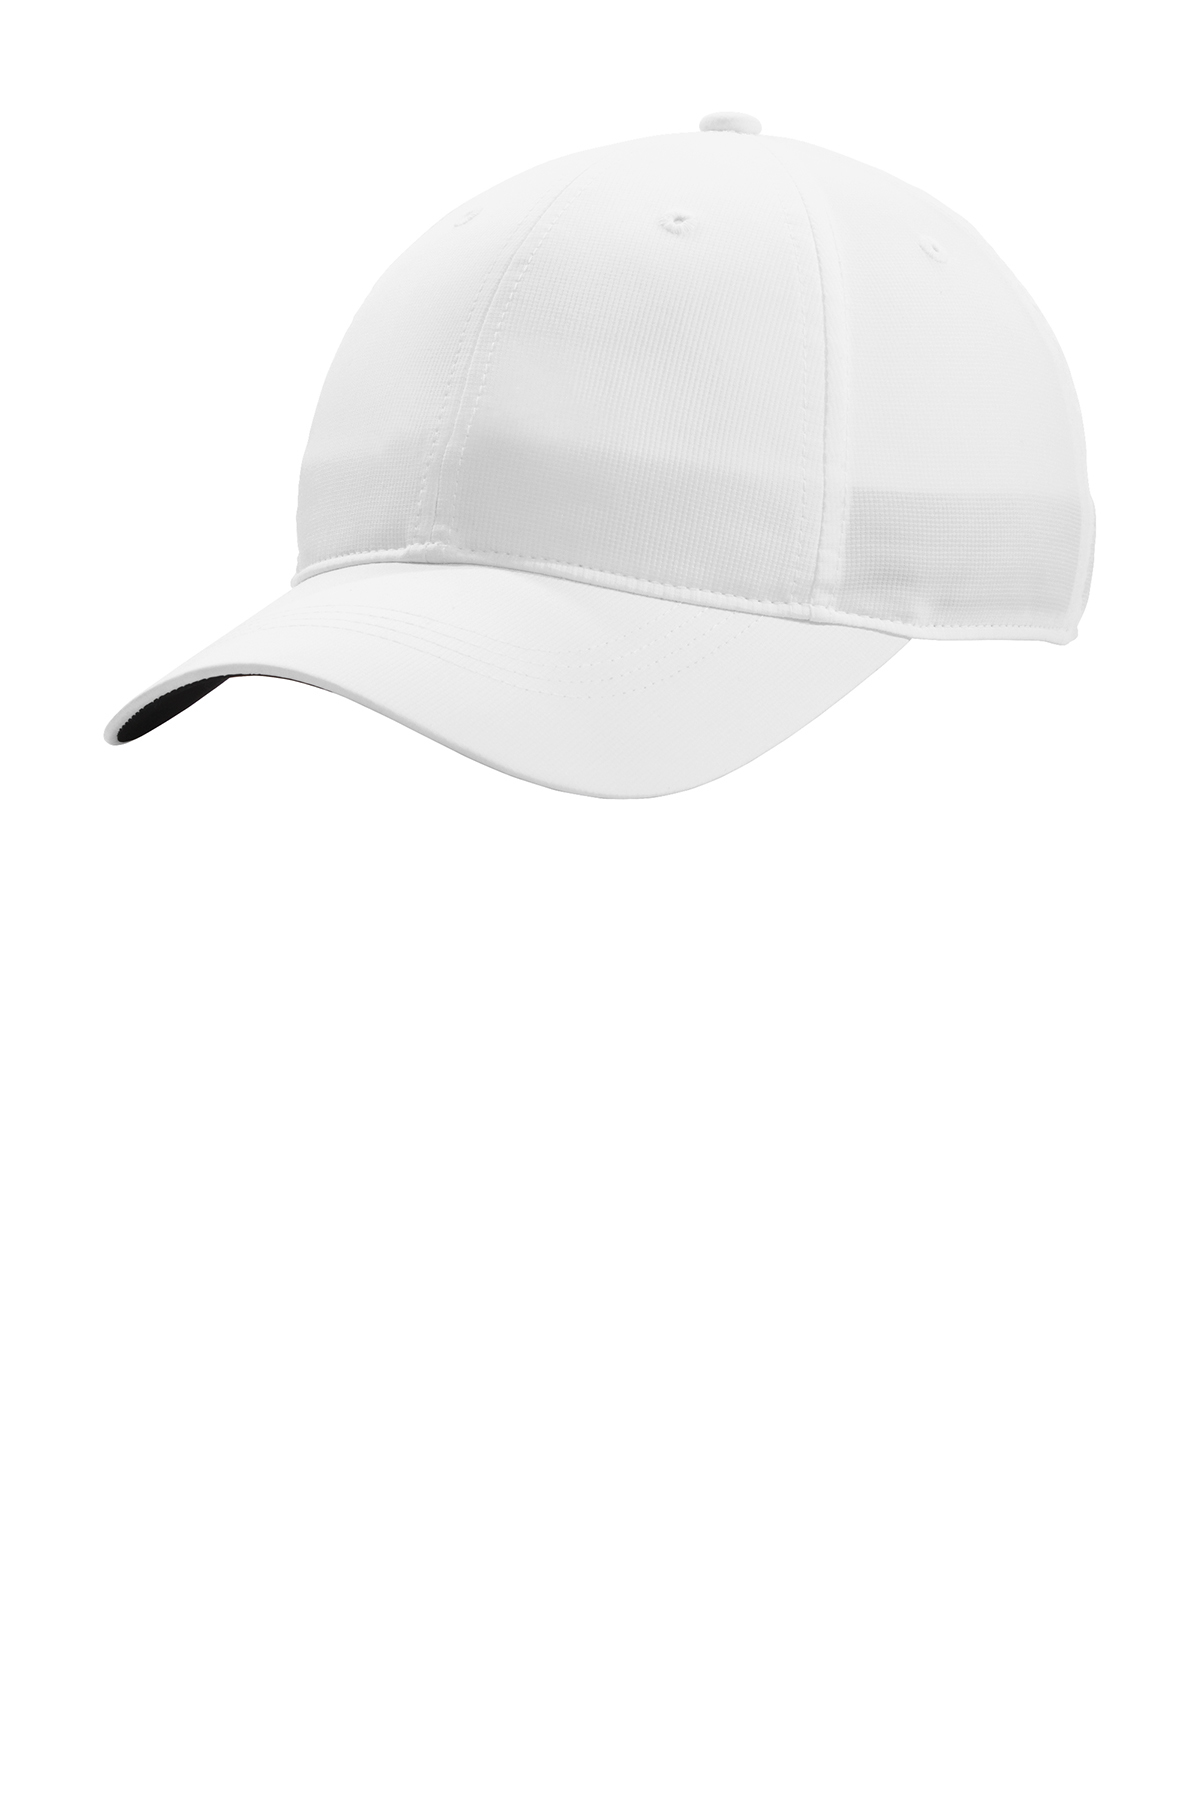 c39706c4f Nike Dri-FIT Tech Cap | Caps | SanMar